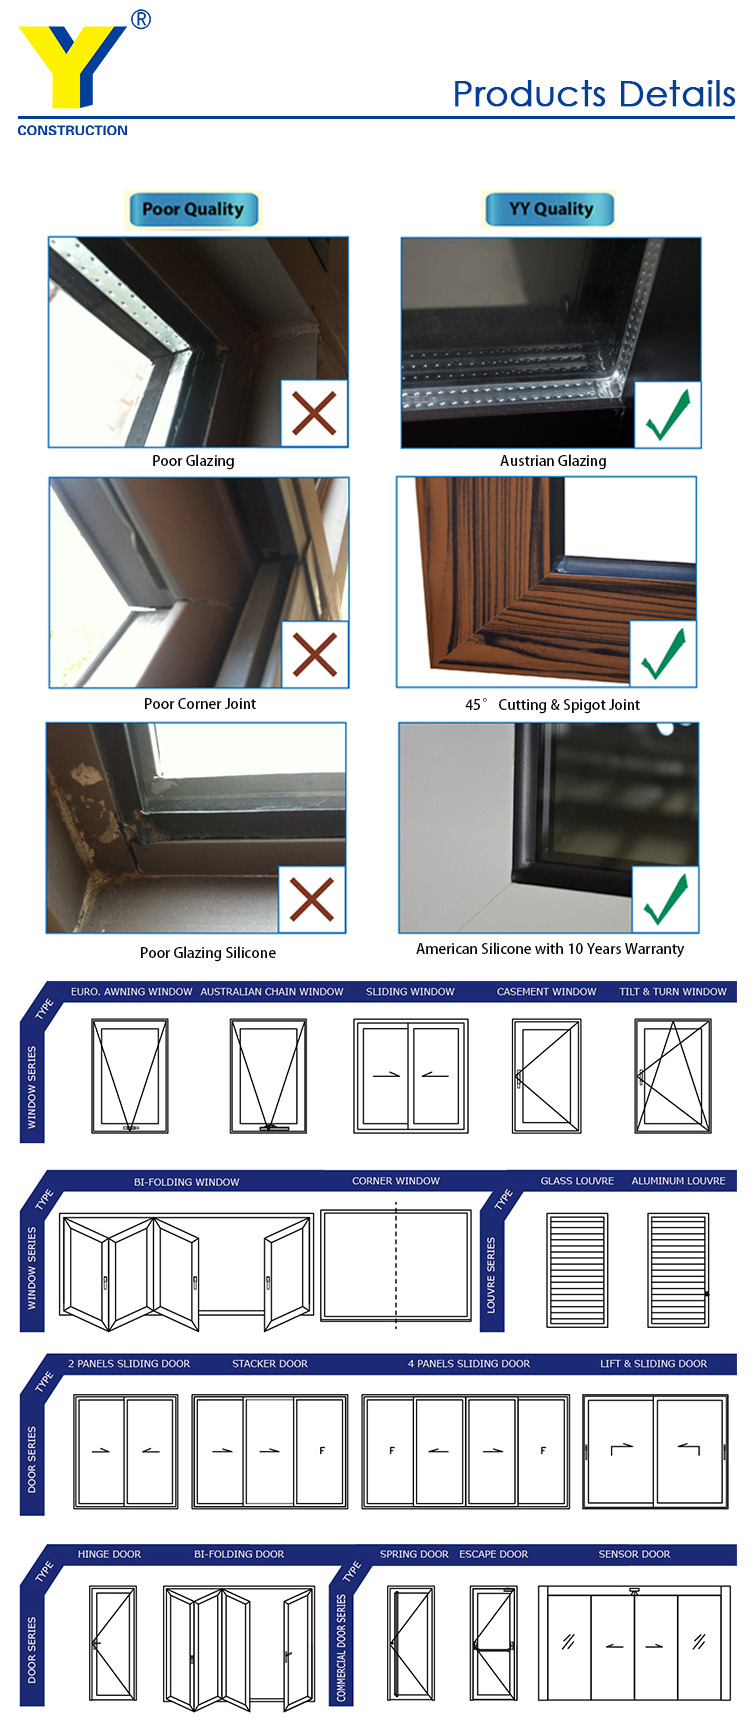 Powder Coated Aluminum Sliding Door Double Glazed Aluminium Windows